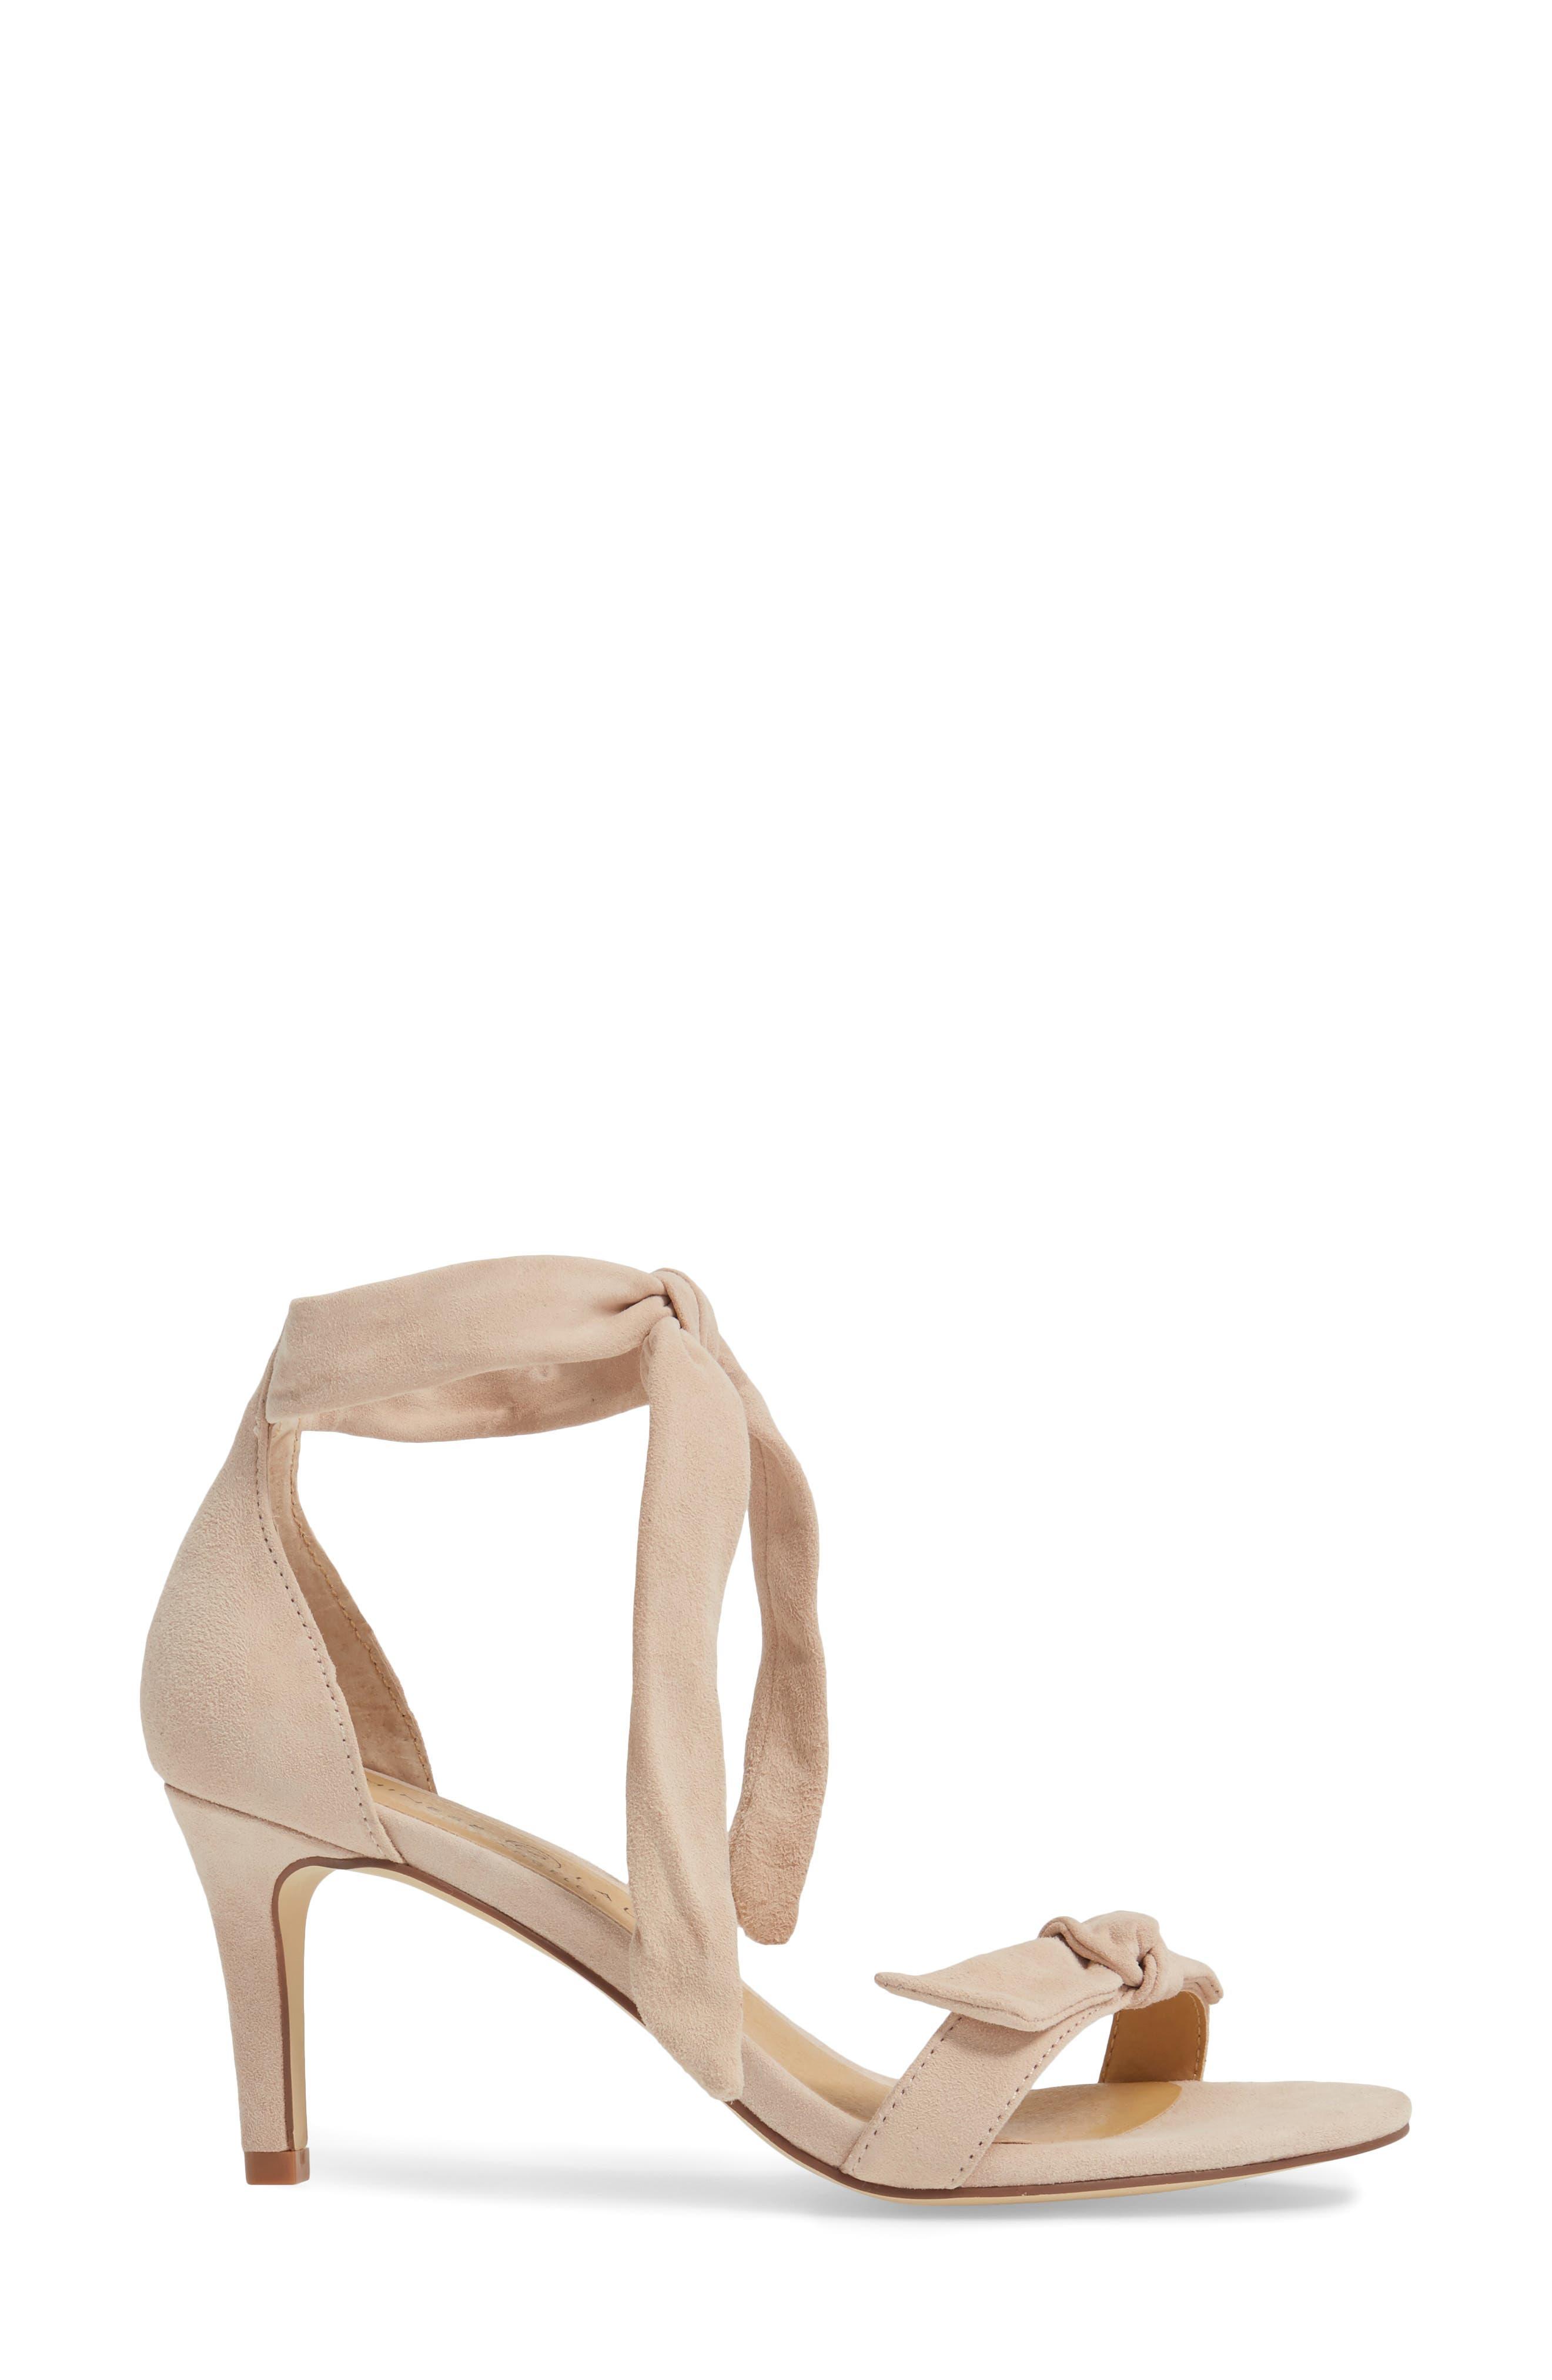 Alternate Image 3  - Chinese Laundry Rhonda Ankle Tie Sandal (Women)